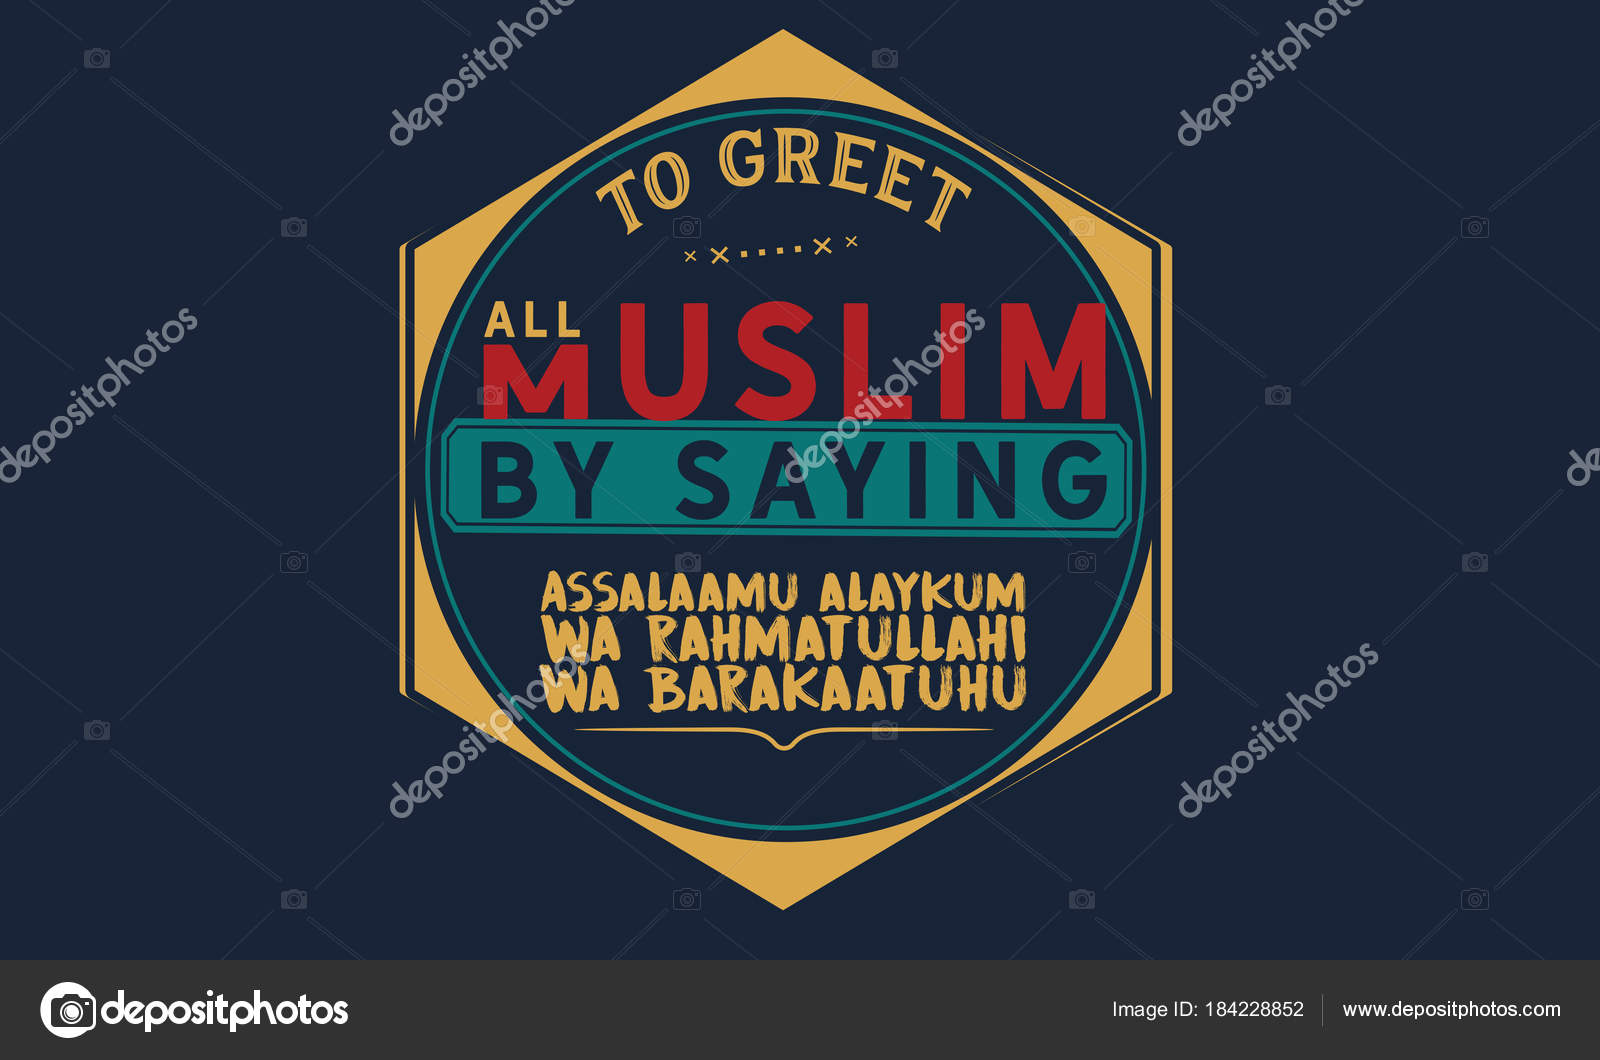 Greet all muslim saying assalaamu alaykum rahmatullahi barakaatuhu greet all muslim saying assalaamu alaykum rahmatullahi barakaatuhu stock vector m4hsunfo